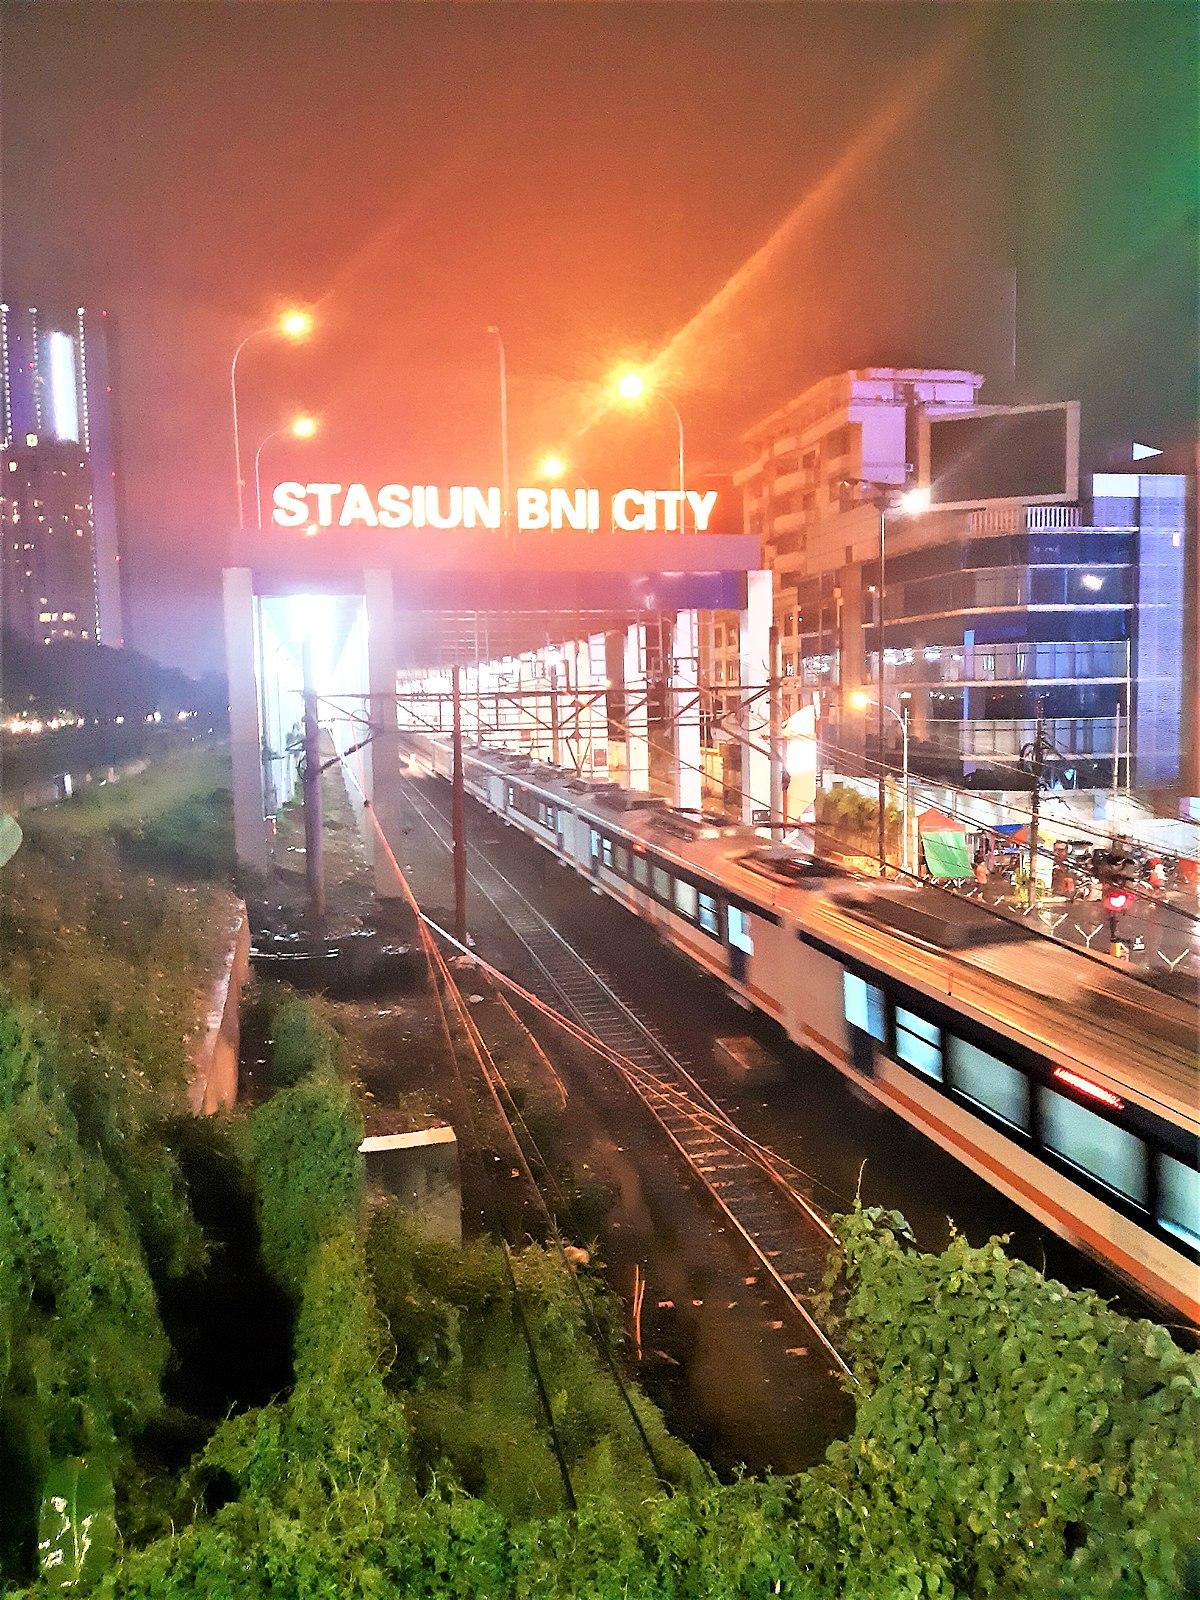 Bni City Railway Station